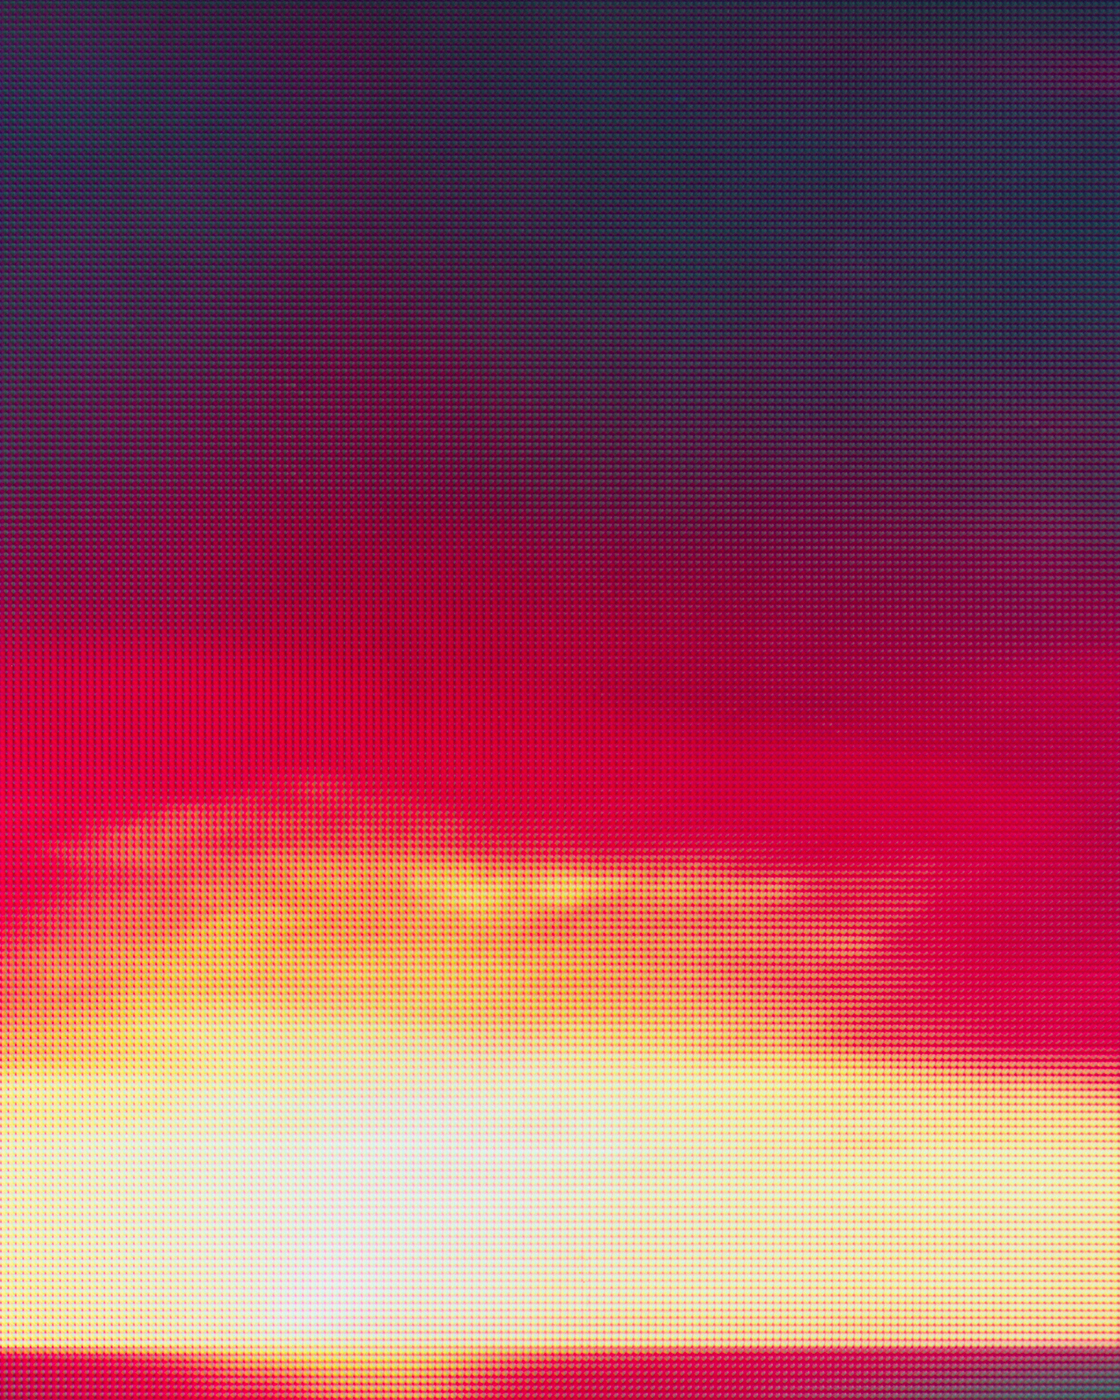 sg_sunset_60.jpg